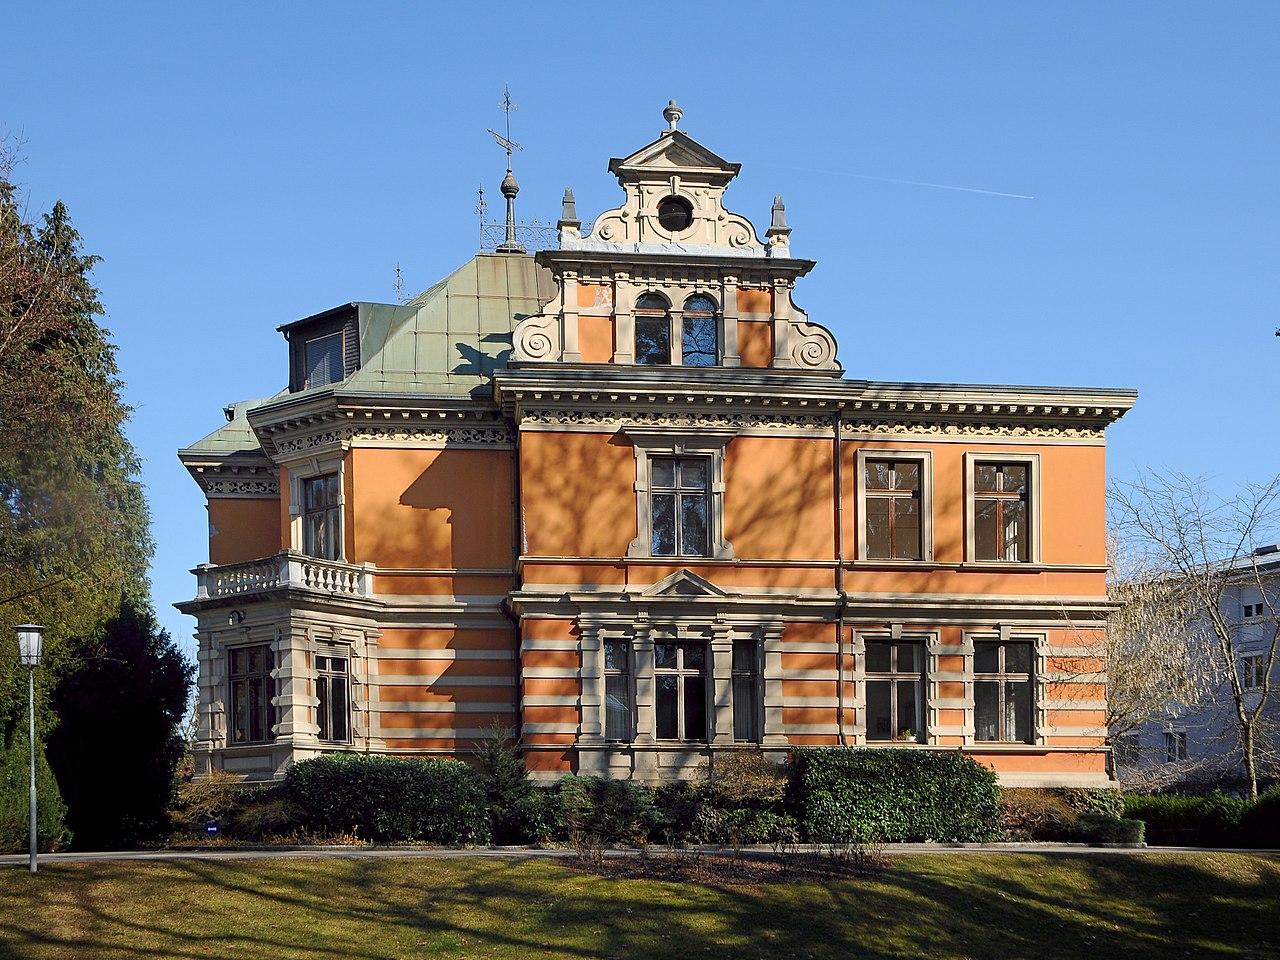 Foto Villa Claudia Nemu Buff Ef Bf Bd